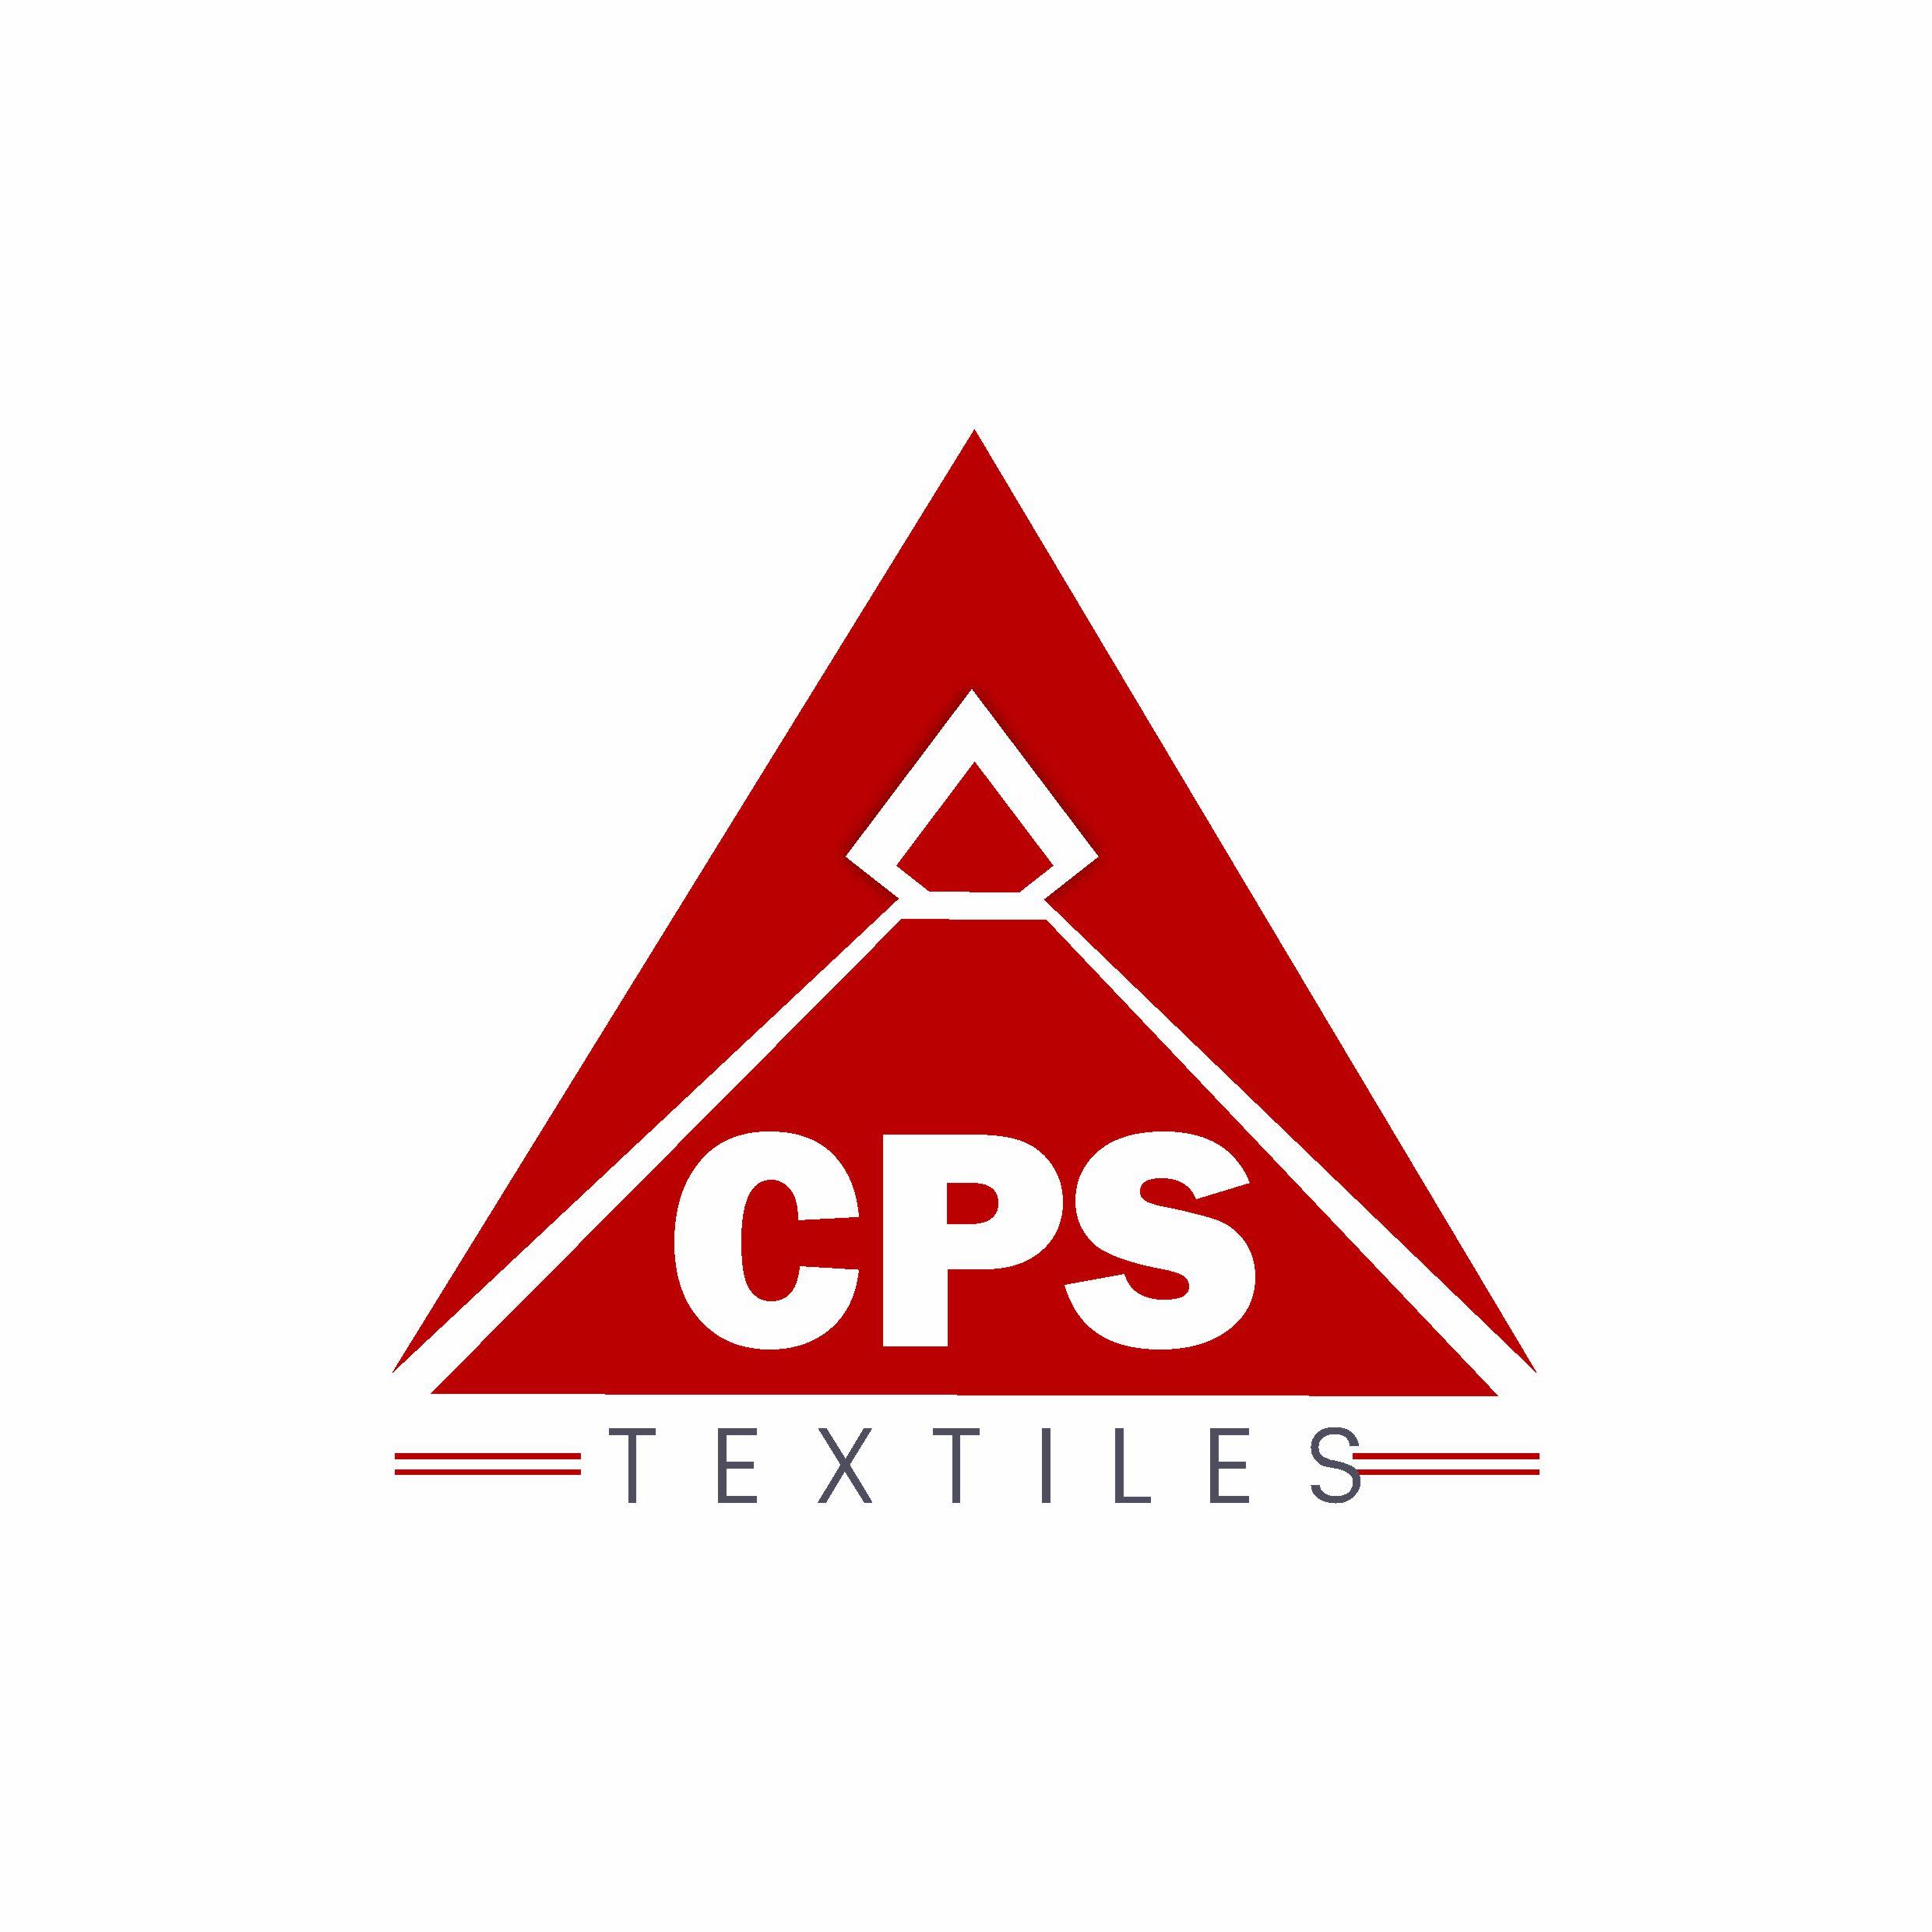 CPS Textiles